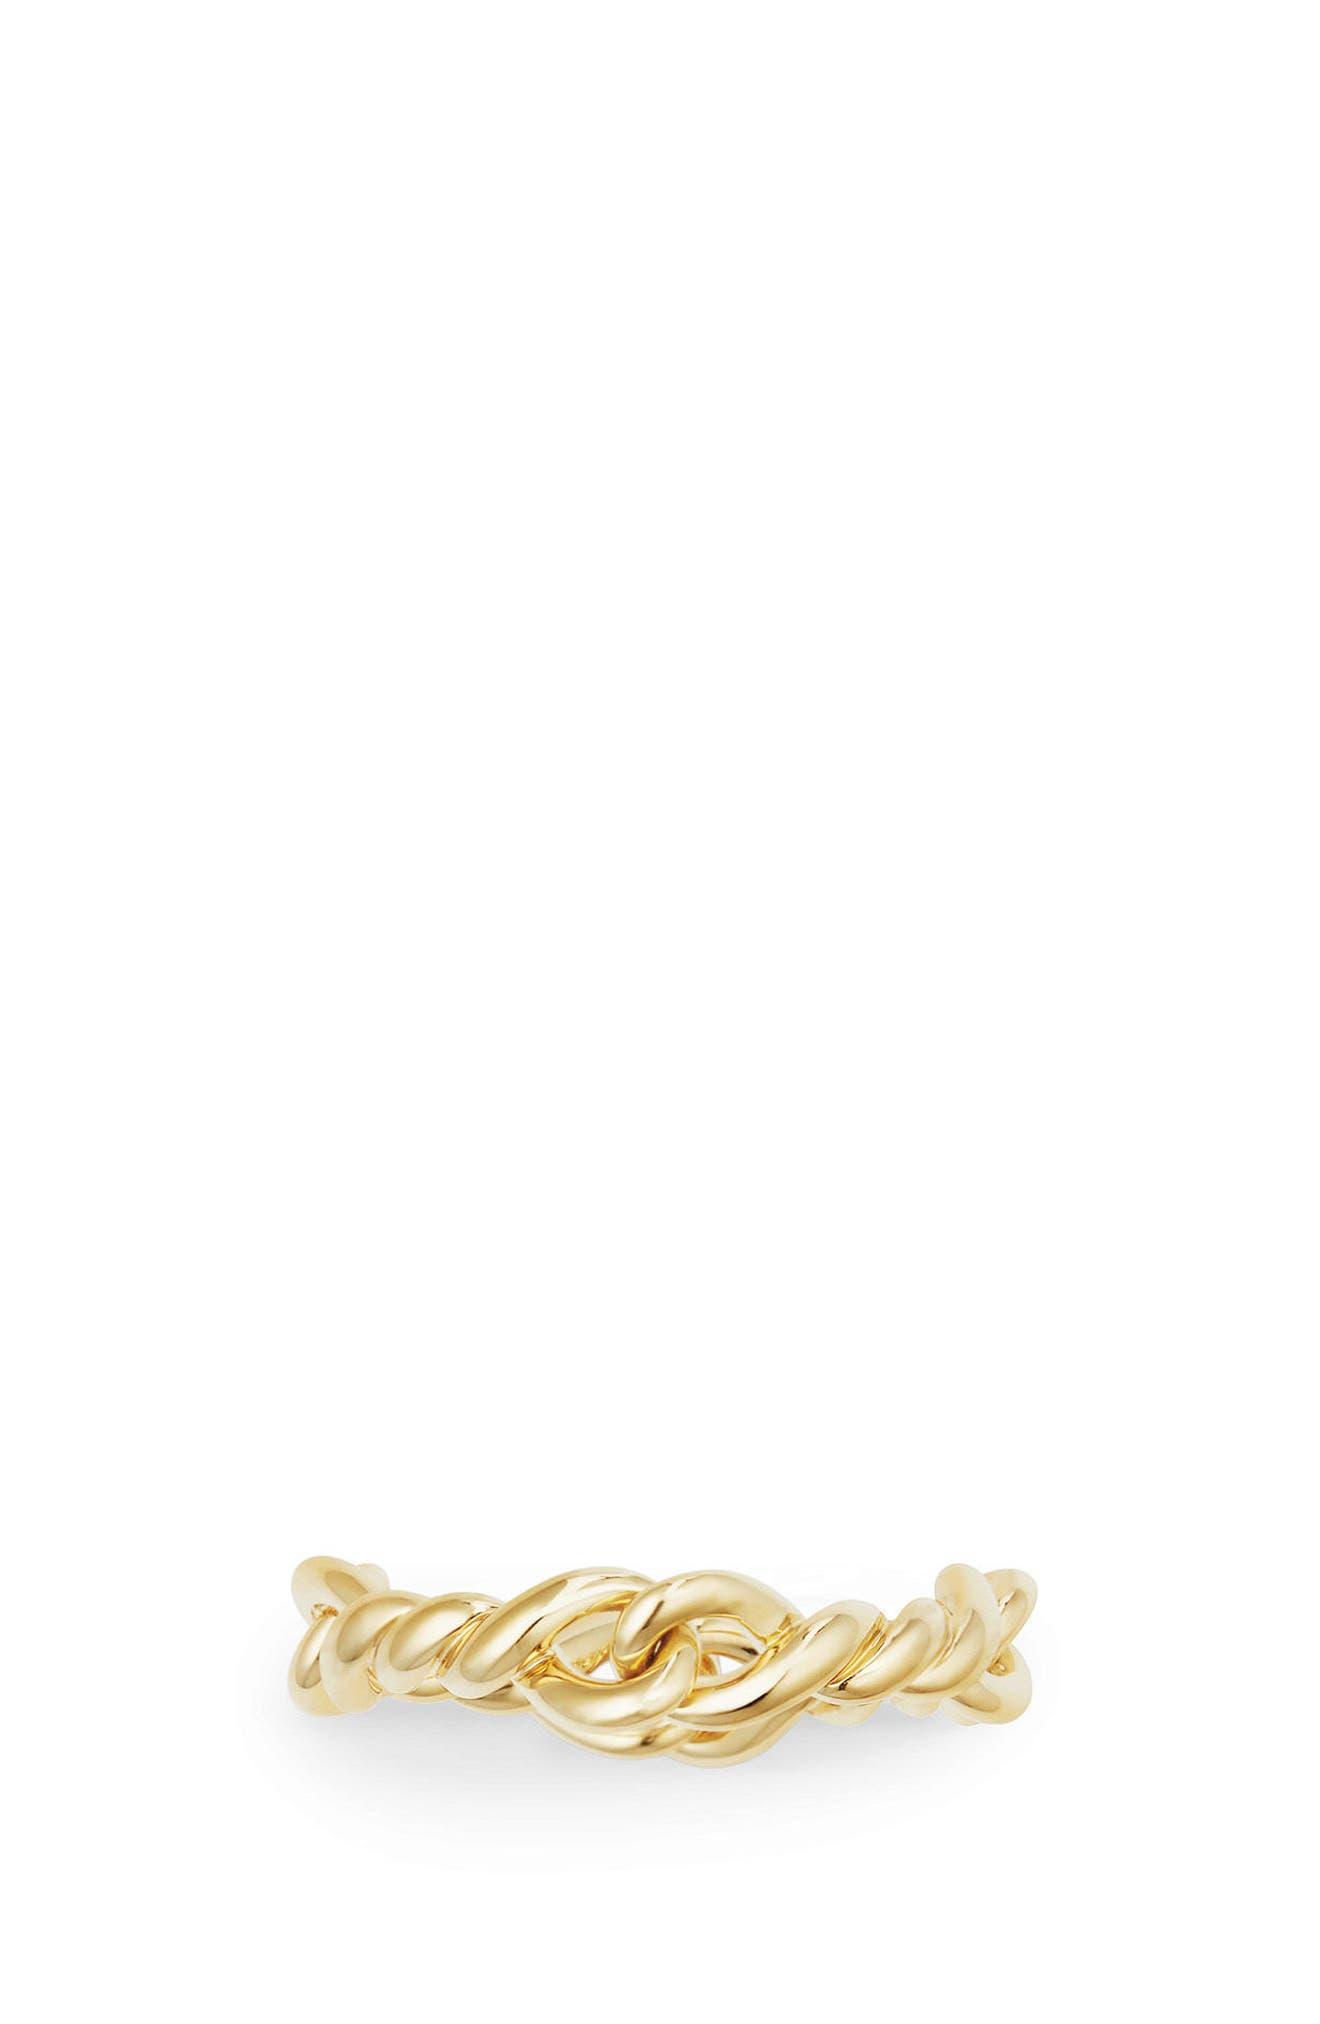 DAVID YURMAN,                             Continuance Ring in 18K Gold,                             Alternate thumbnail 3, color,                             YELLOW GOLD